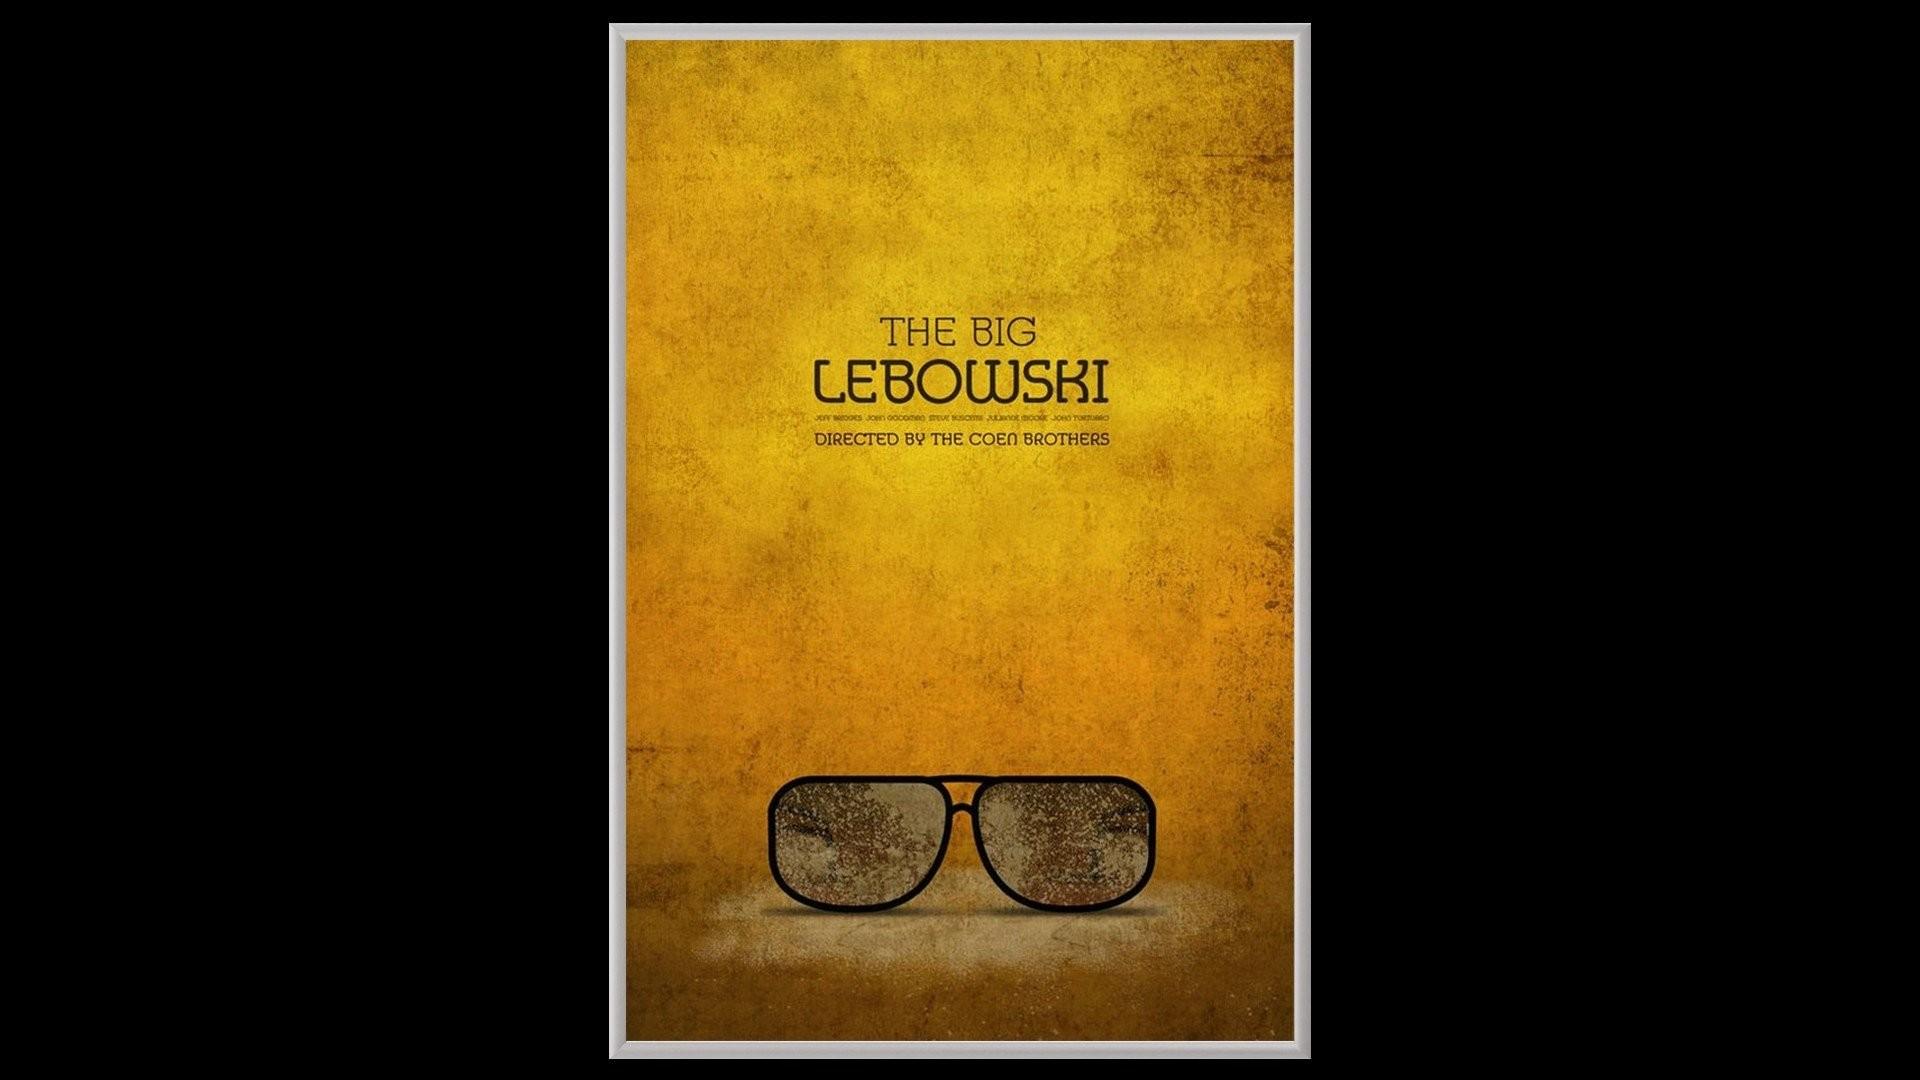 HD Wallpaper   Background ID:414772. Movie The Big Lebowski. 0  Like. Favorite